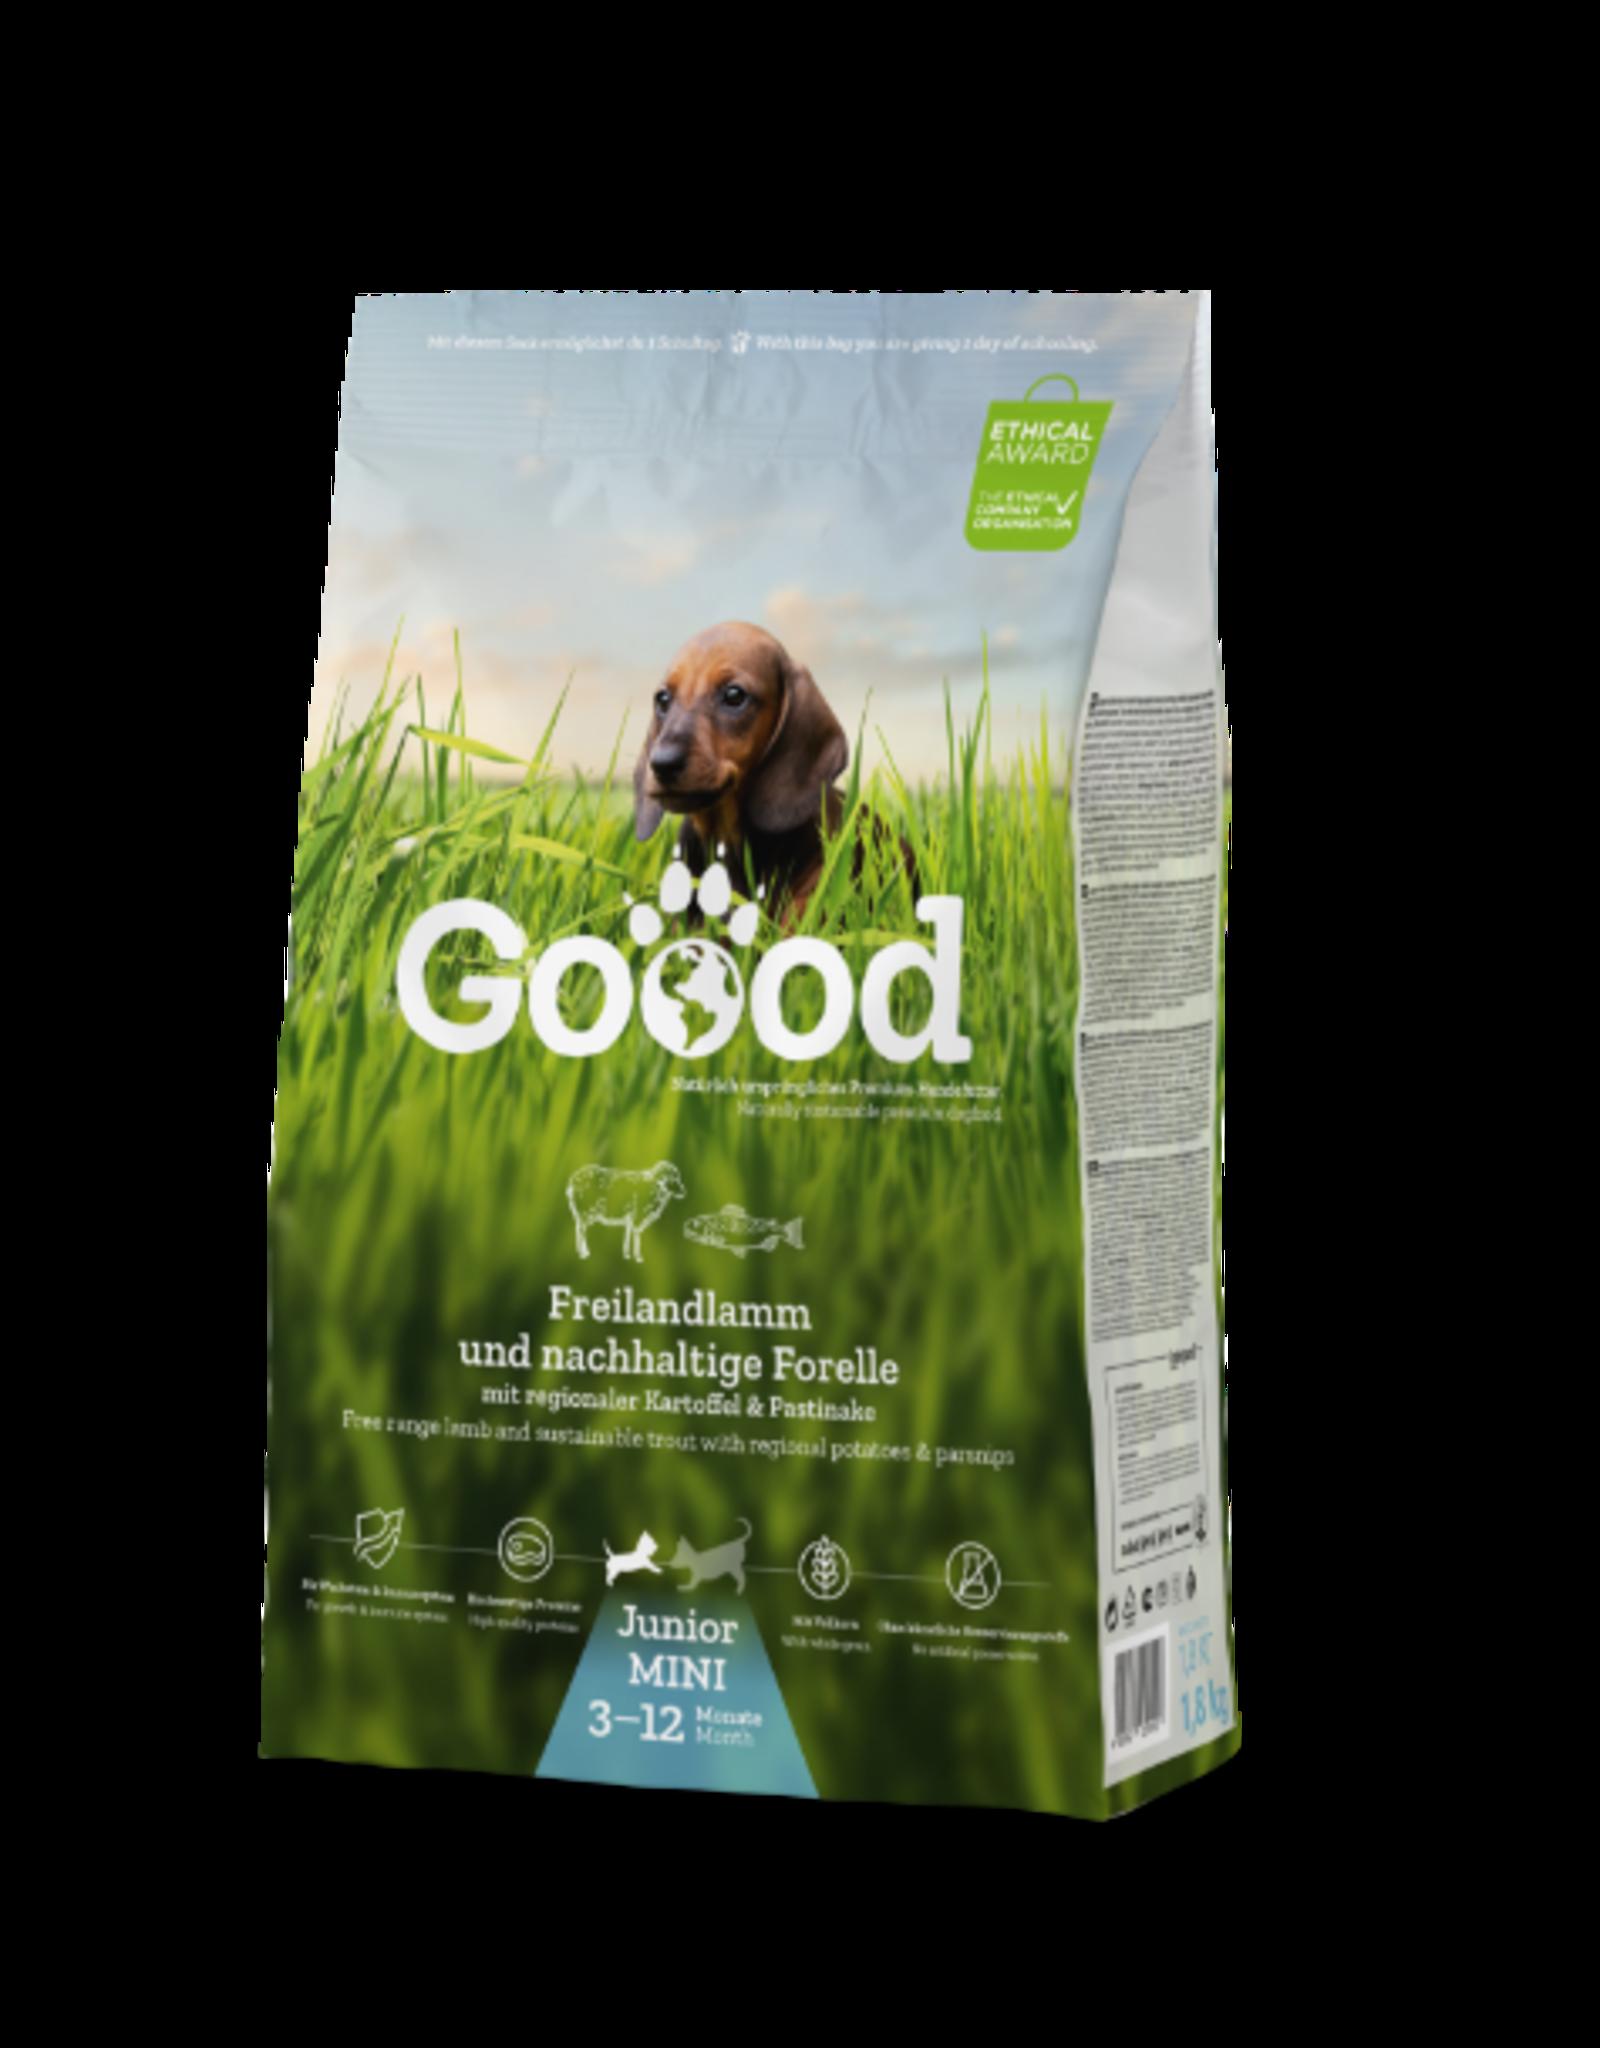 Goood Goood Mini Junior Vrije uitloop lam & duurzame forel- brok - 1,8 kg